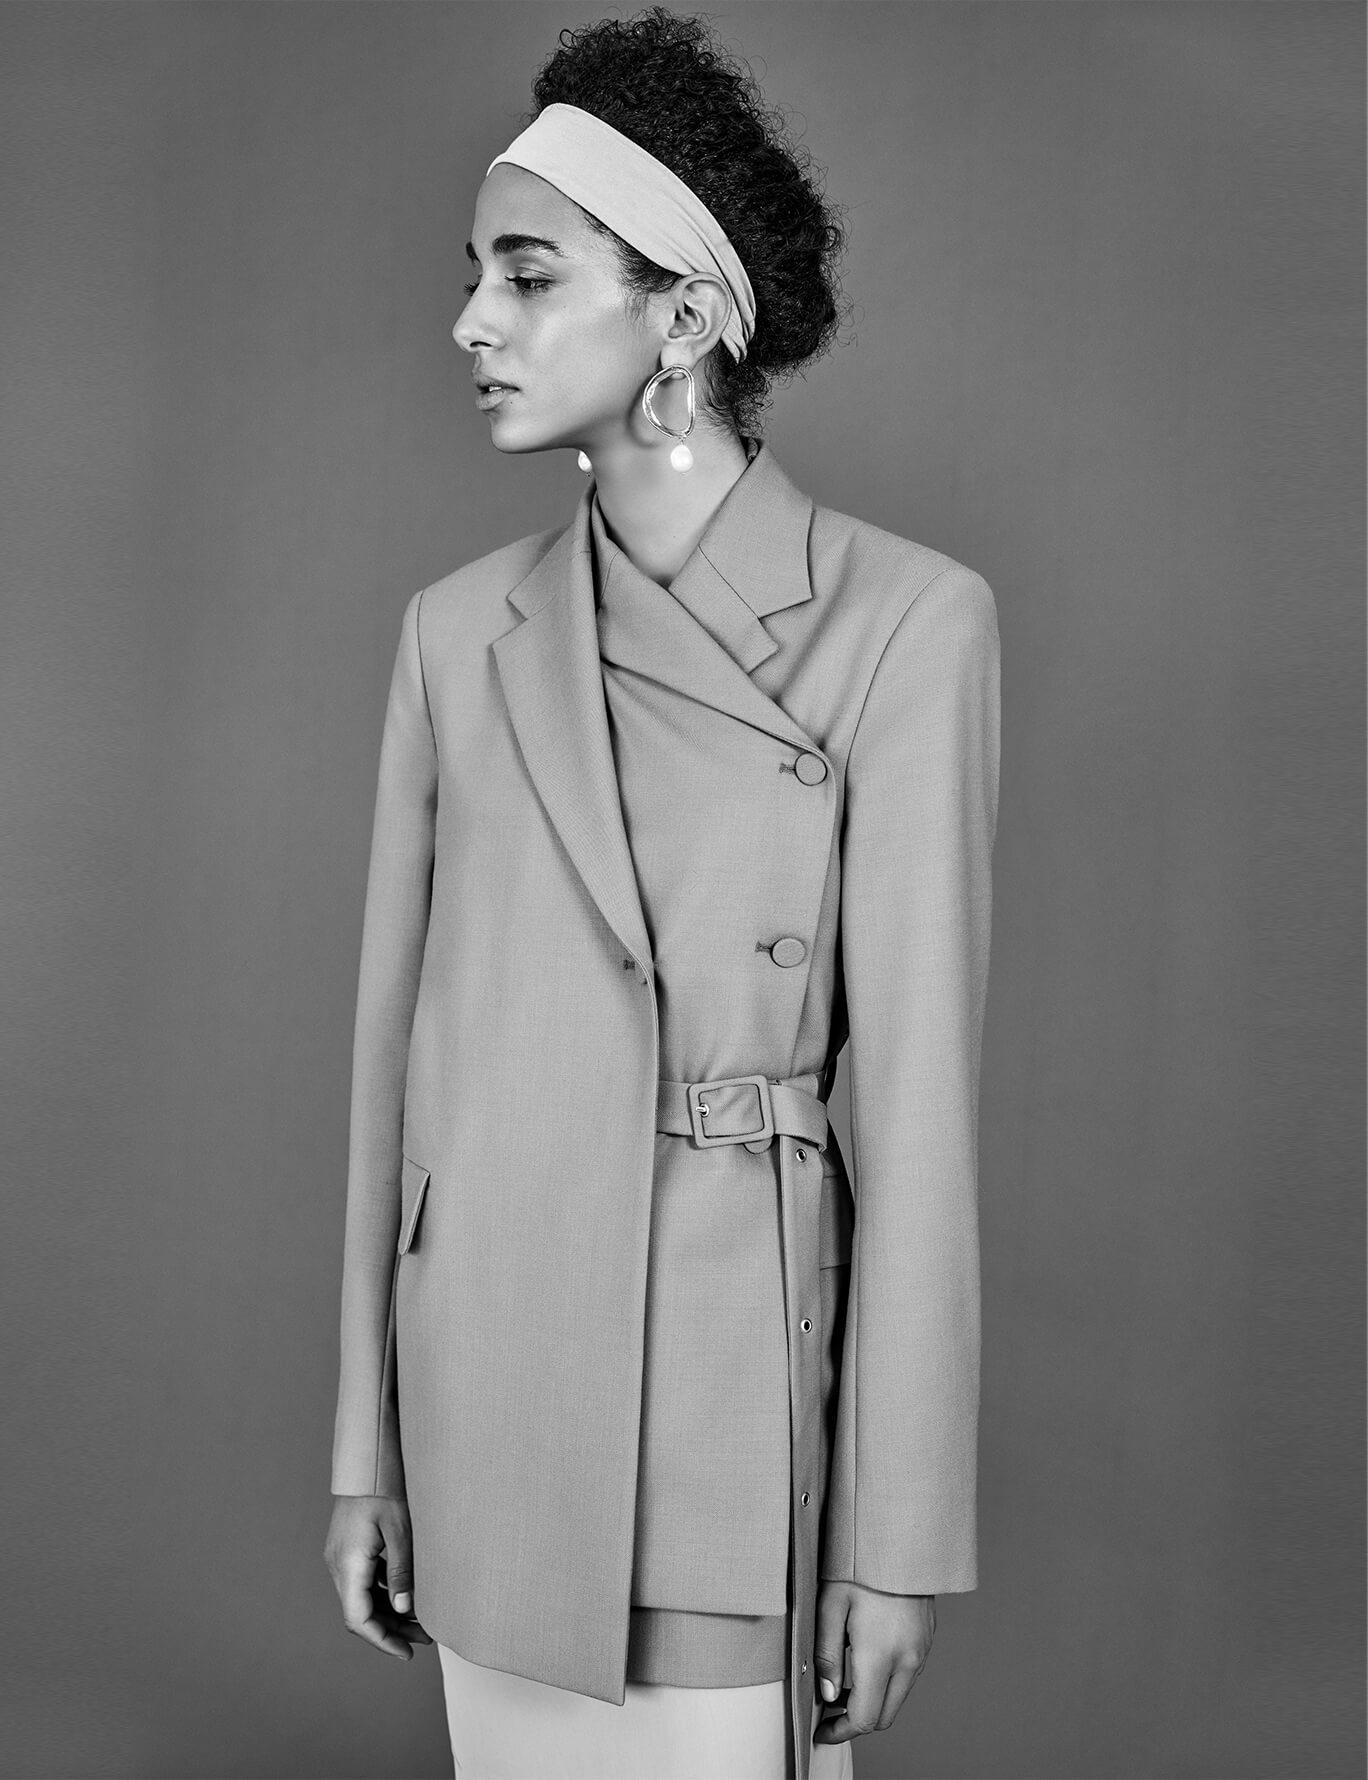 the-modist-fashion-shoot-3.jpg